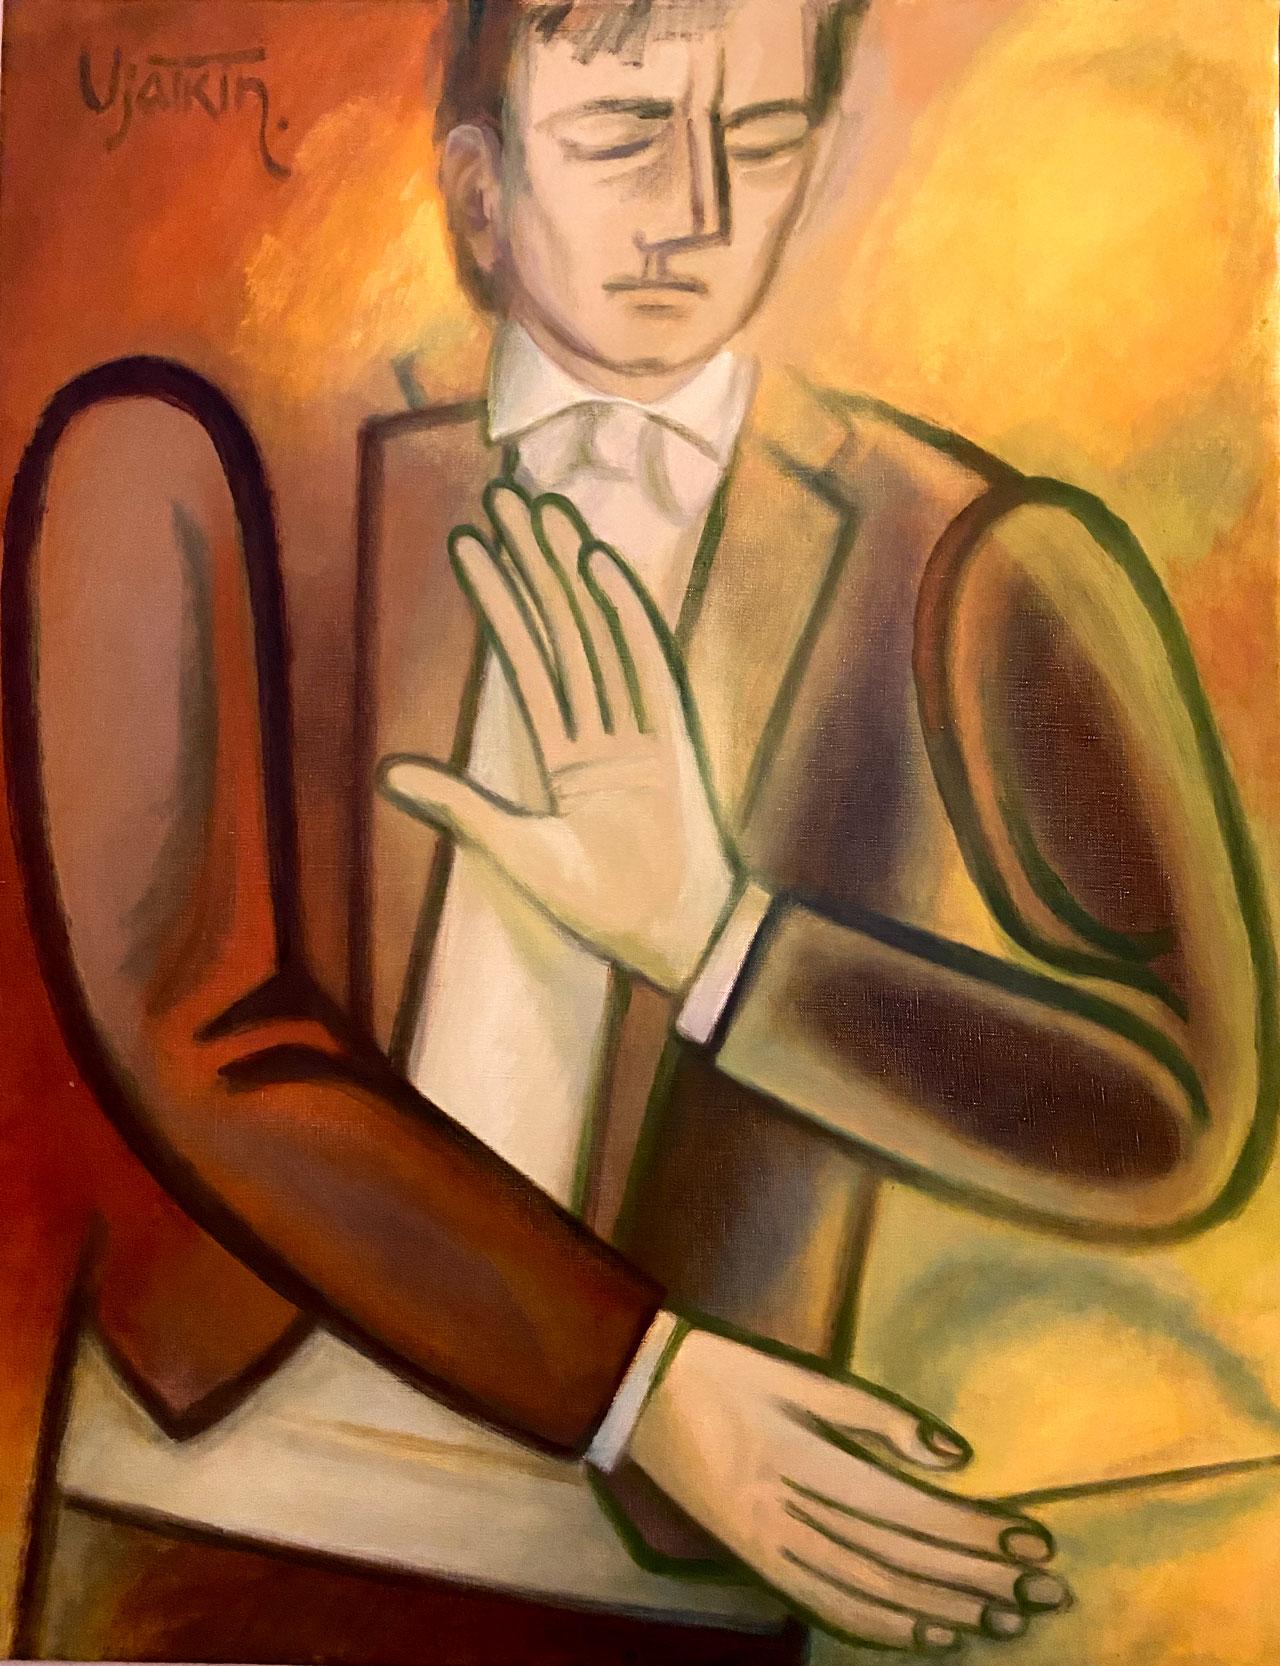 """Der Dirigent P.-D. Ponnelle"" I 168x85 I Öl auf Leinwand I 2004 I Gleb Viatkin I 1934* I Wolgograd"